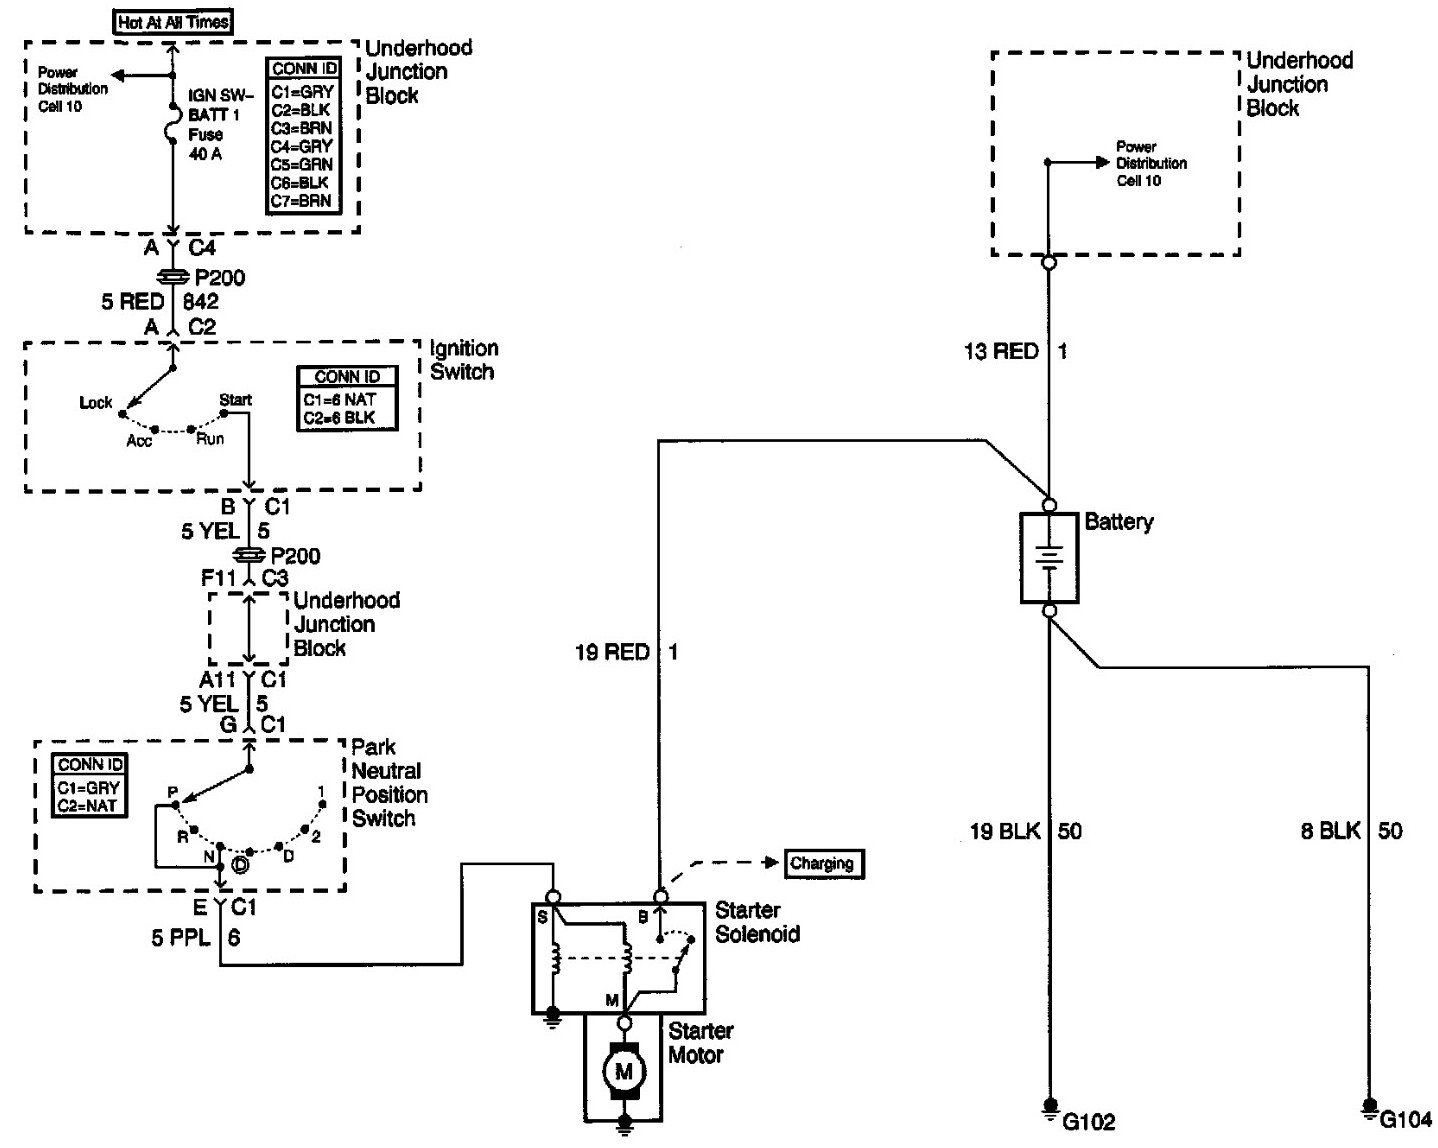 Chevy Malibu Ignition Switch Wiring Diagram